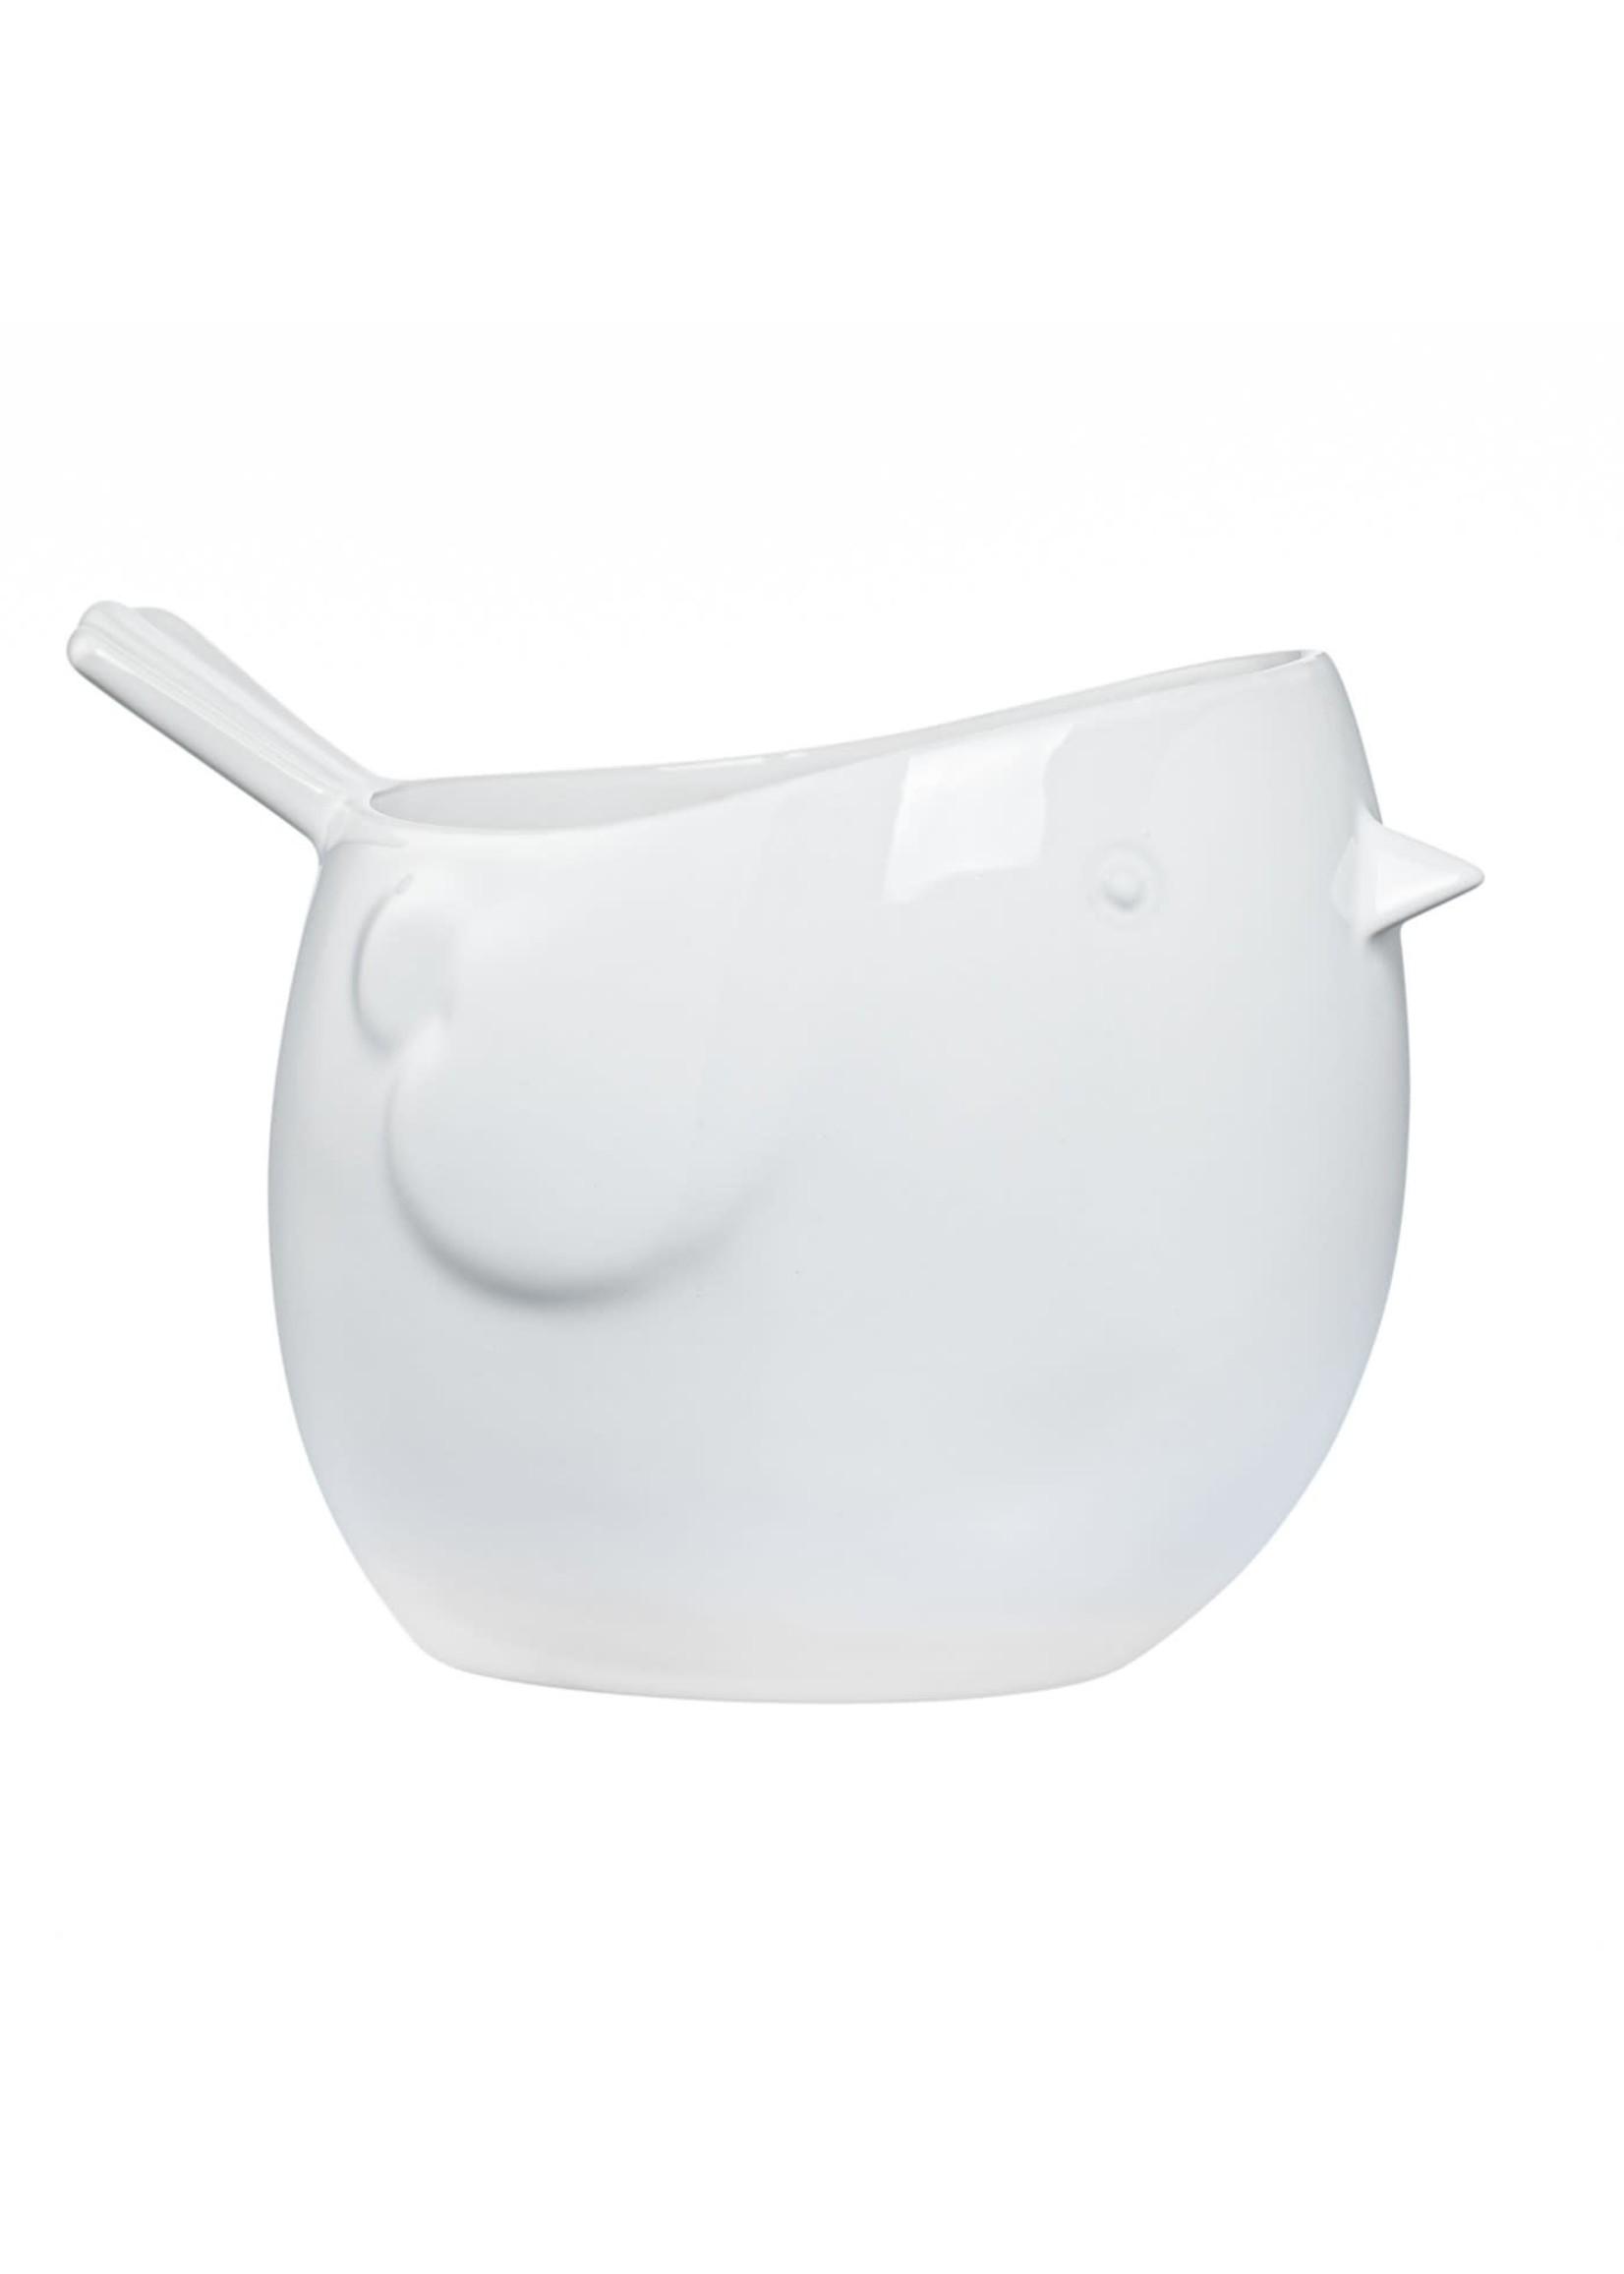 Torre & Tagus Finch Ceramic Pot - White